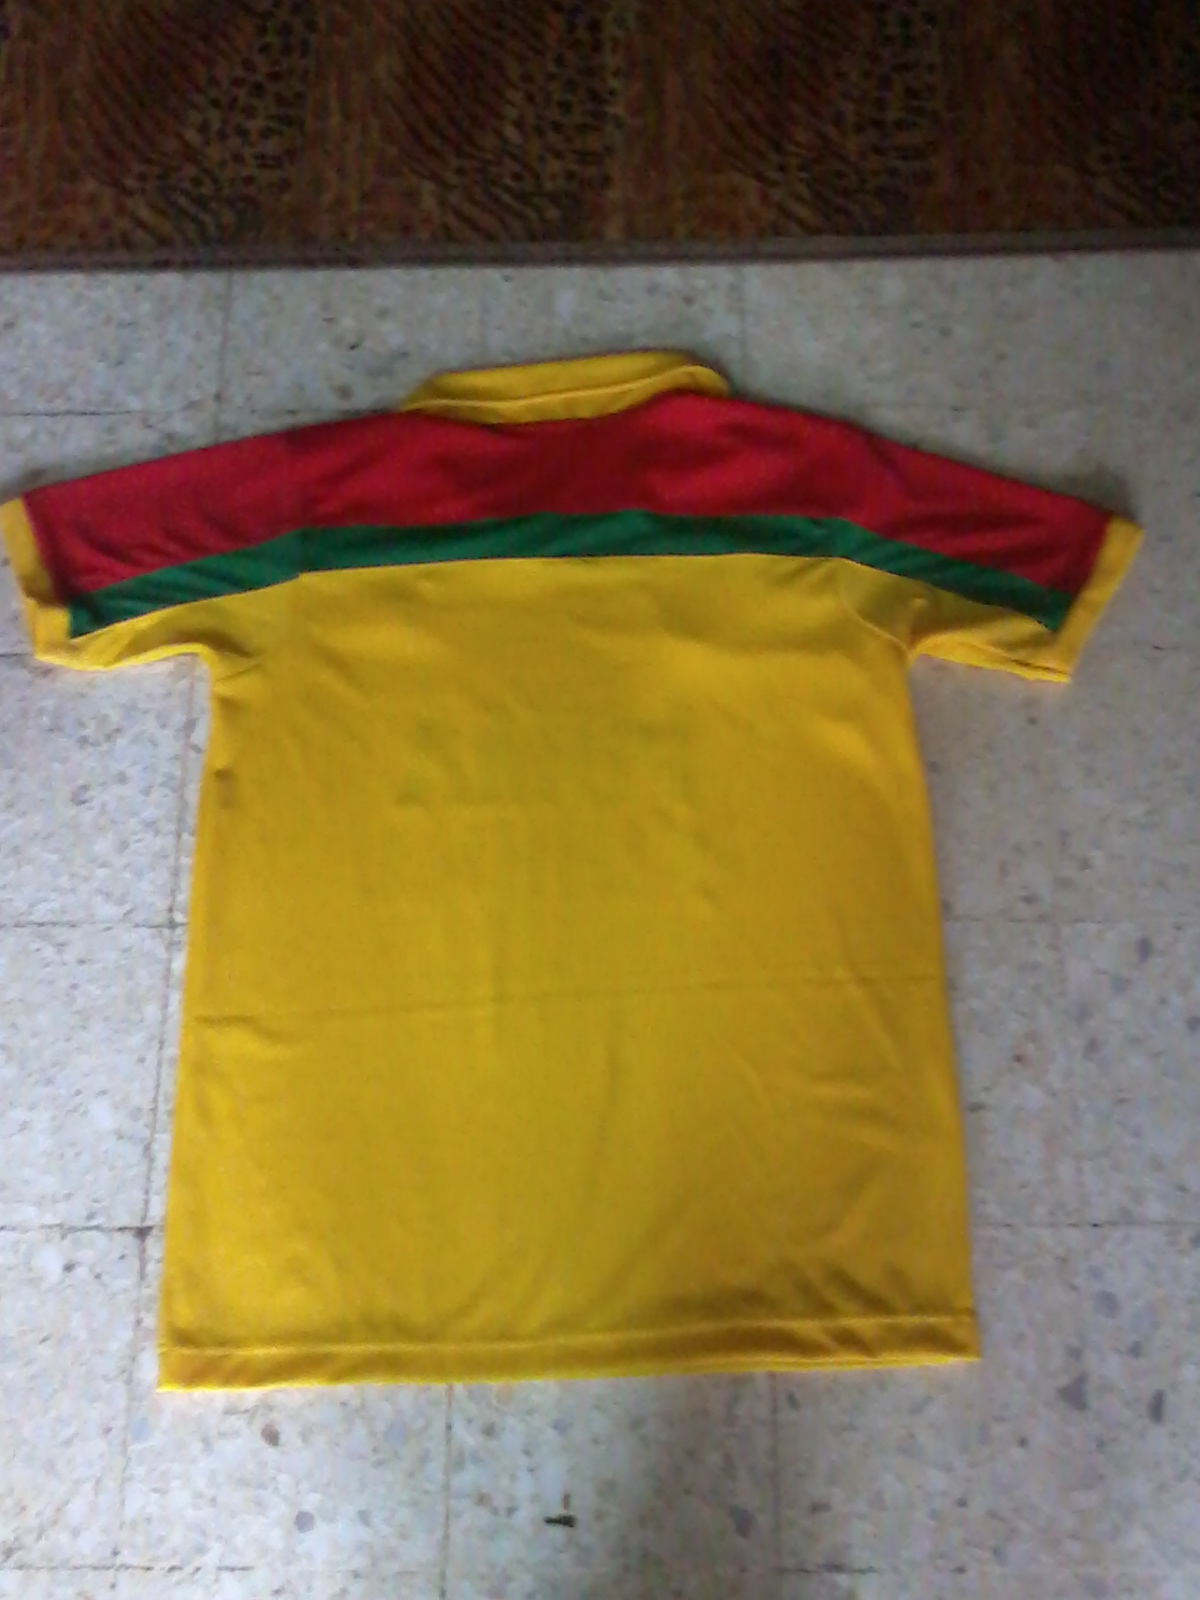 http://1.bp.blogspot.com/-Ib1JsxlRHKA/UCikAHExU8I/AAAAAAAAPU4/z4SC2TVgunY/s1600/Selangor+Jersey.jpg